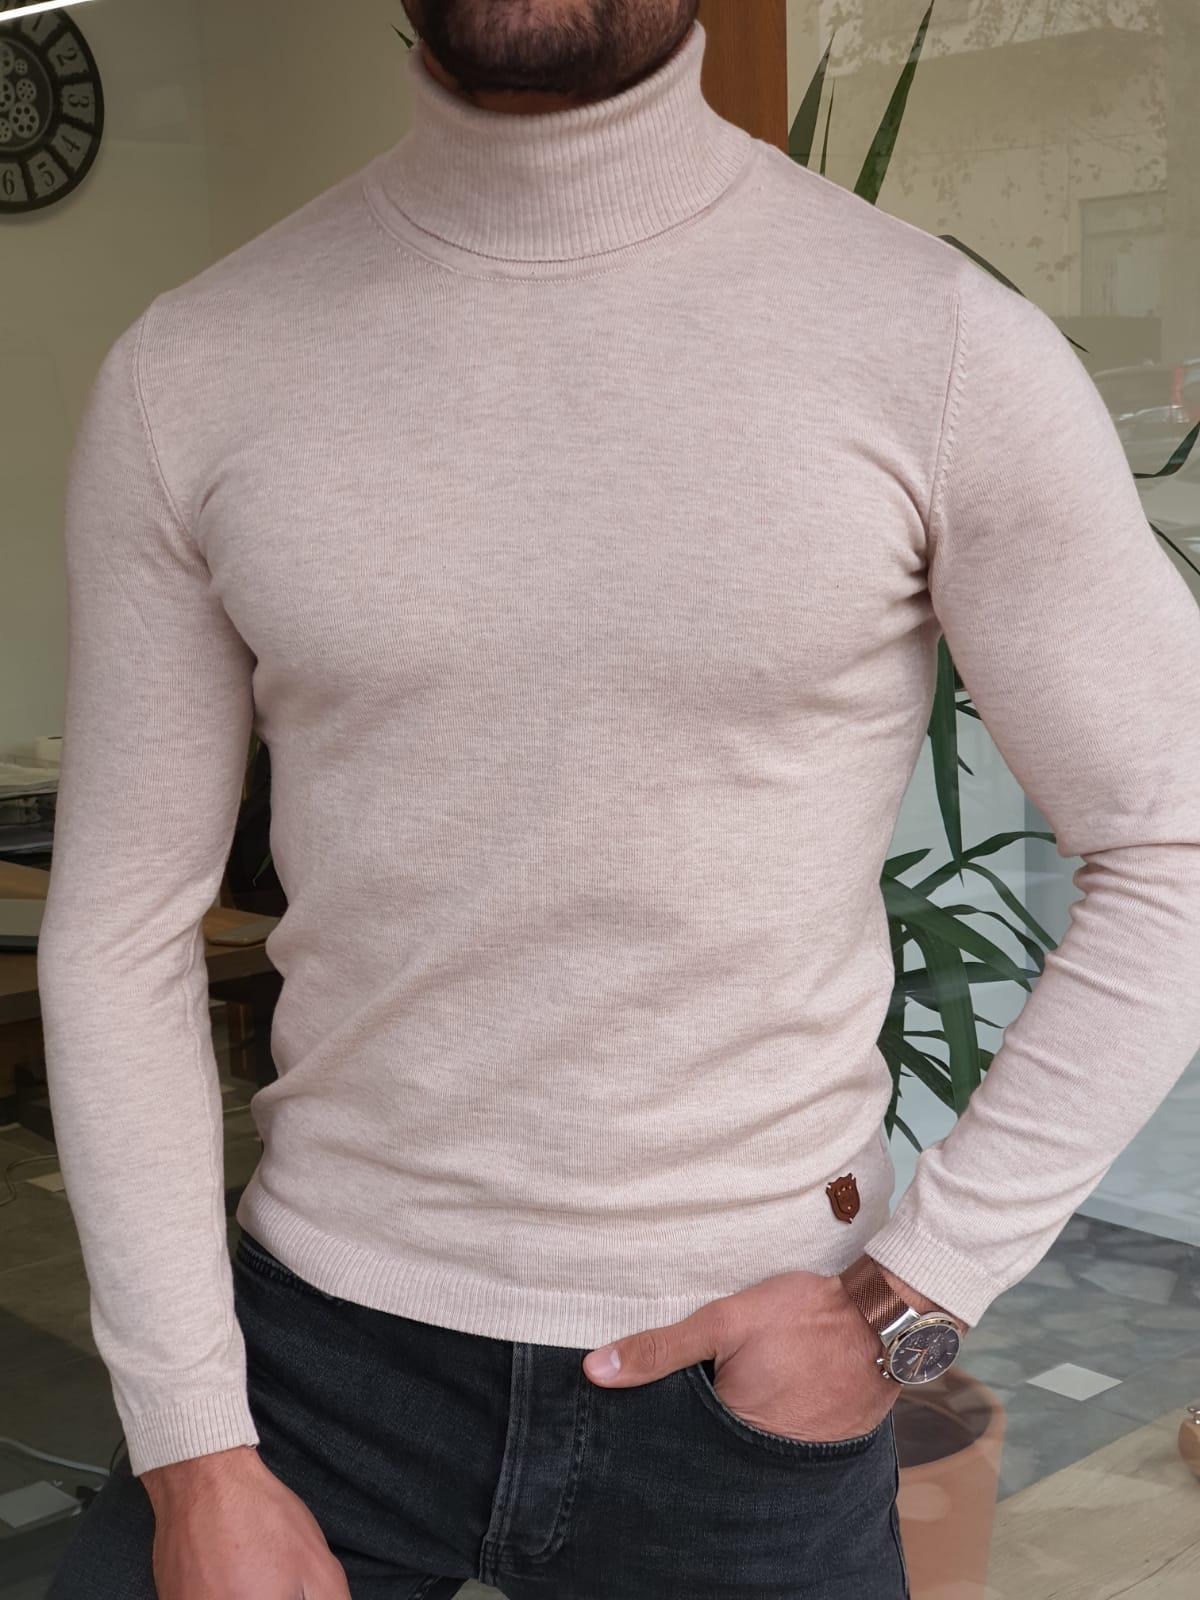 Aysoti Manley Beige Slim Fit Turtleneck Wool Sweater